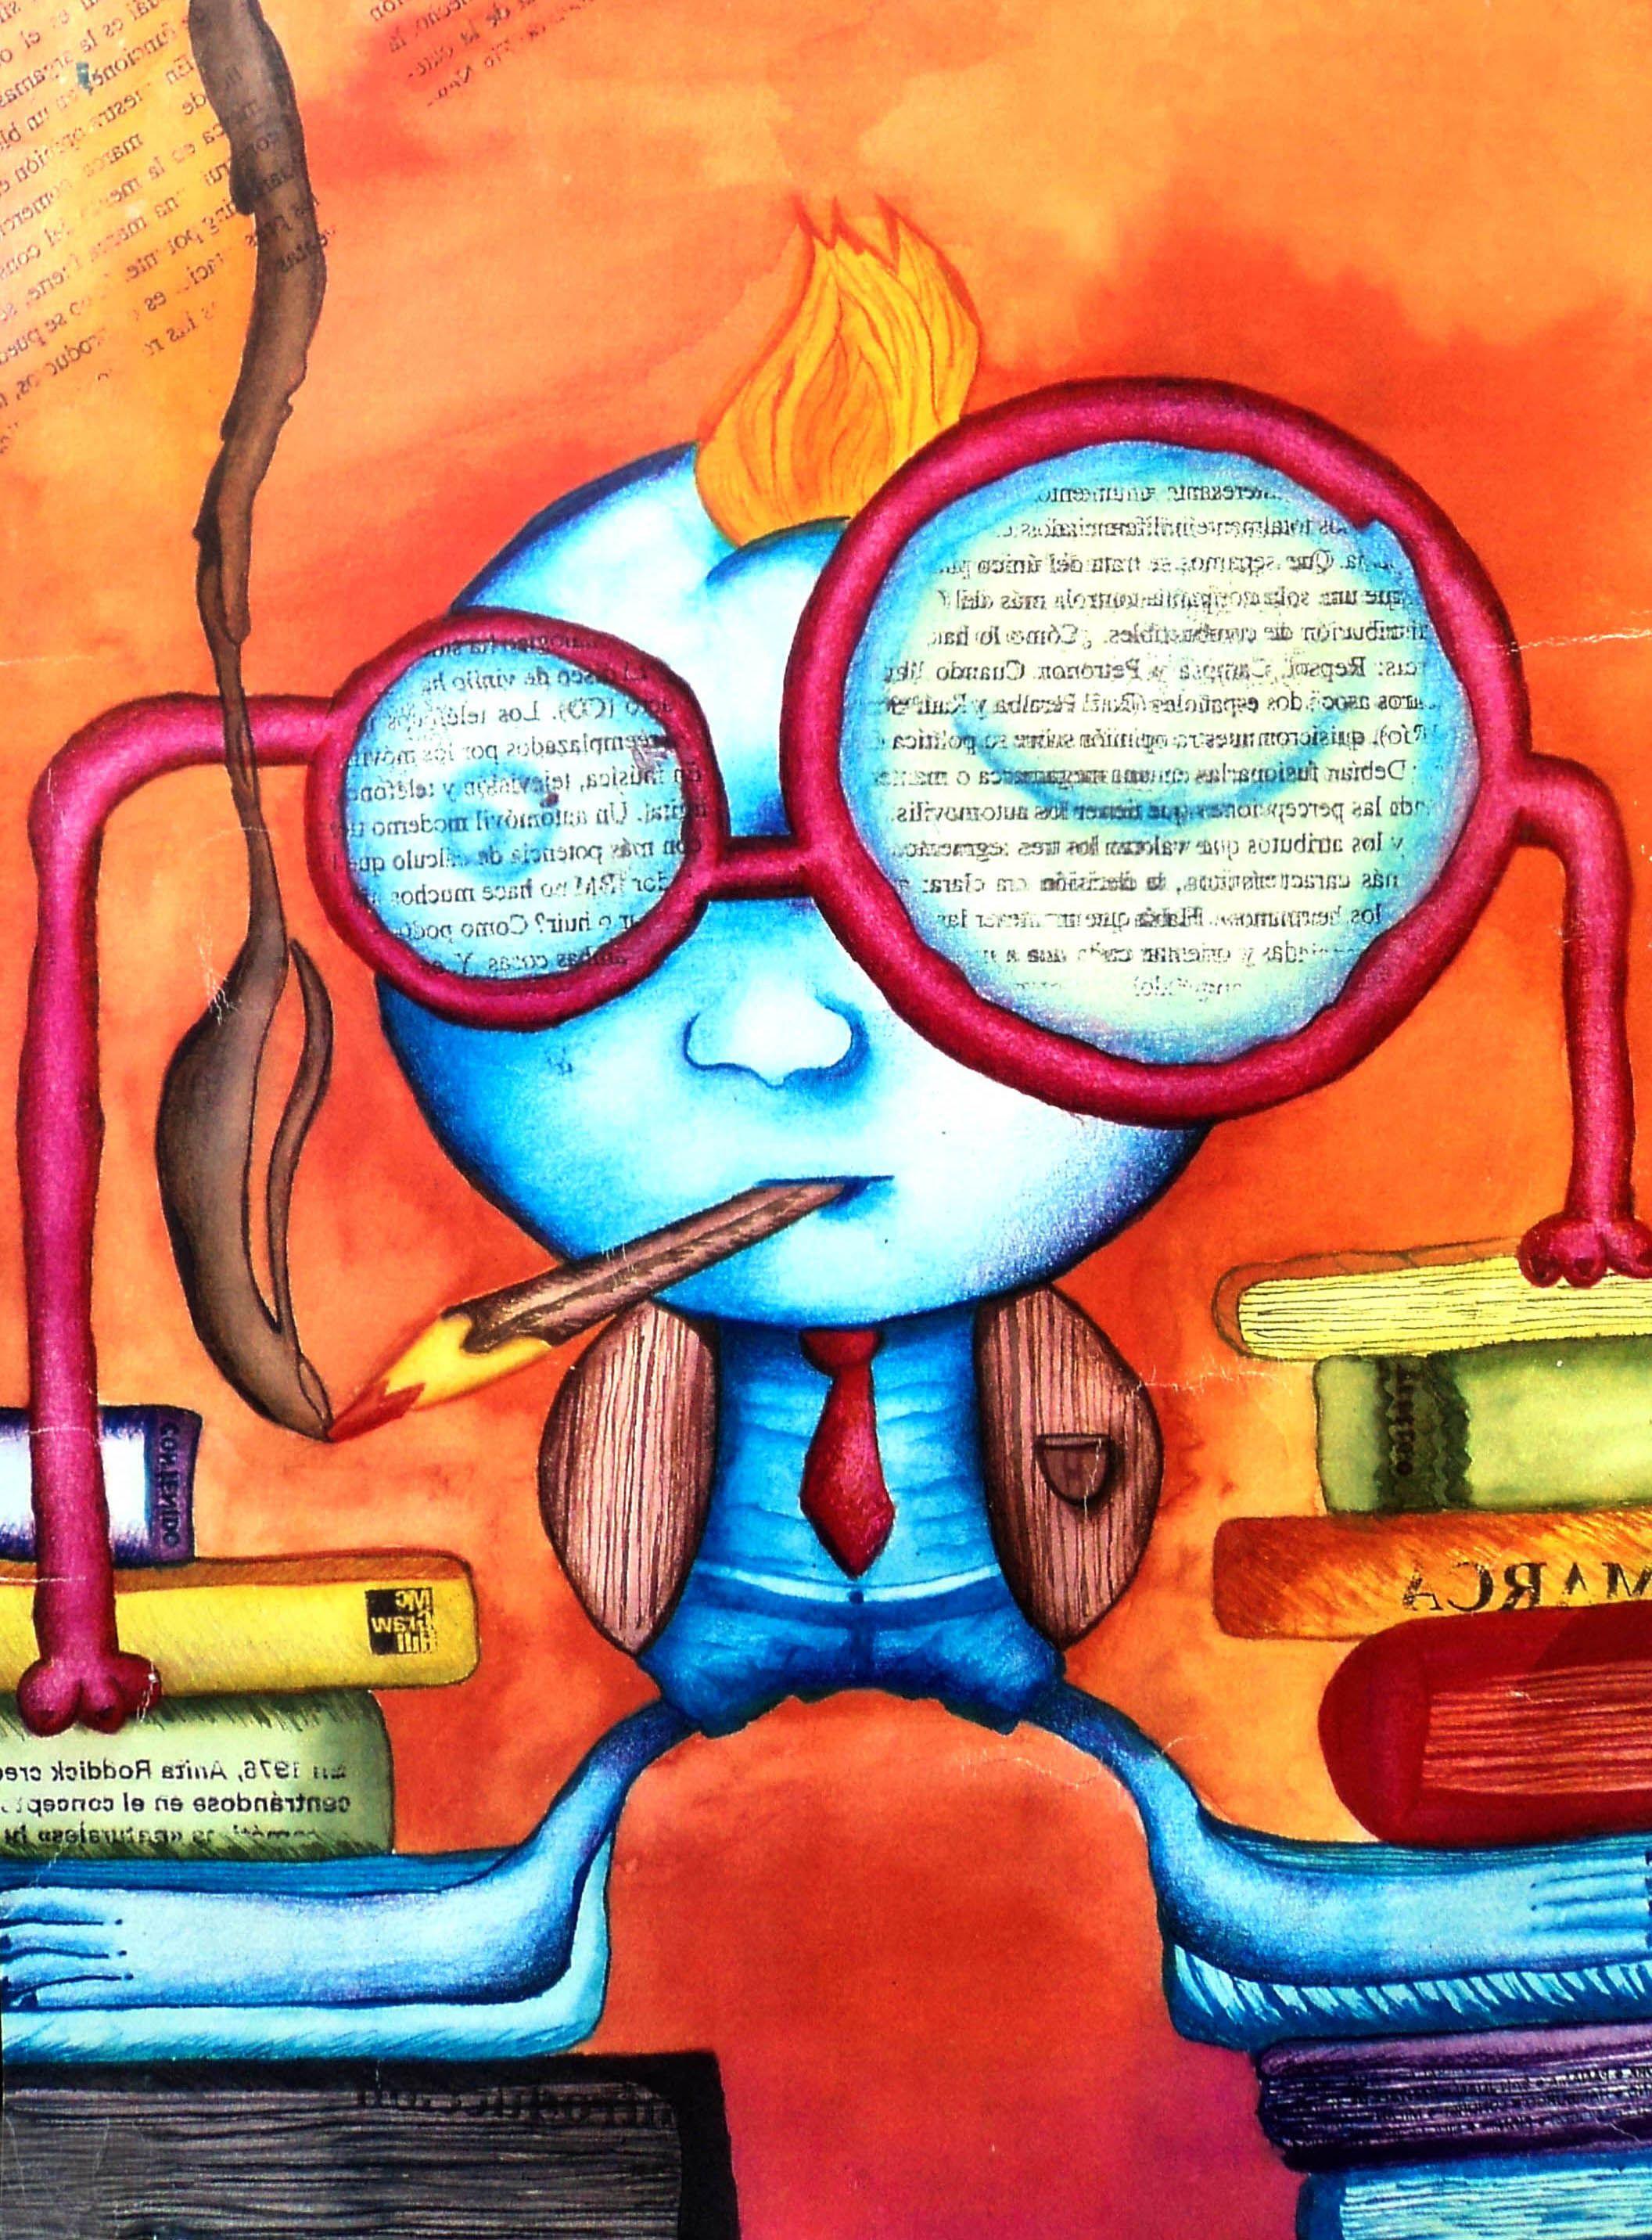 Préndete a la lectura